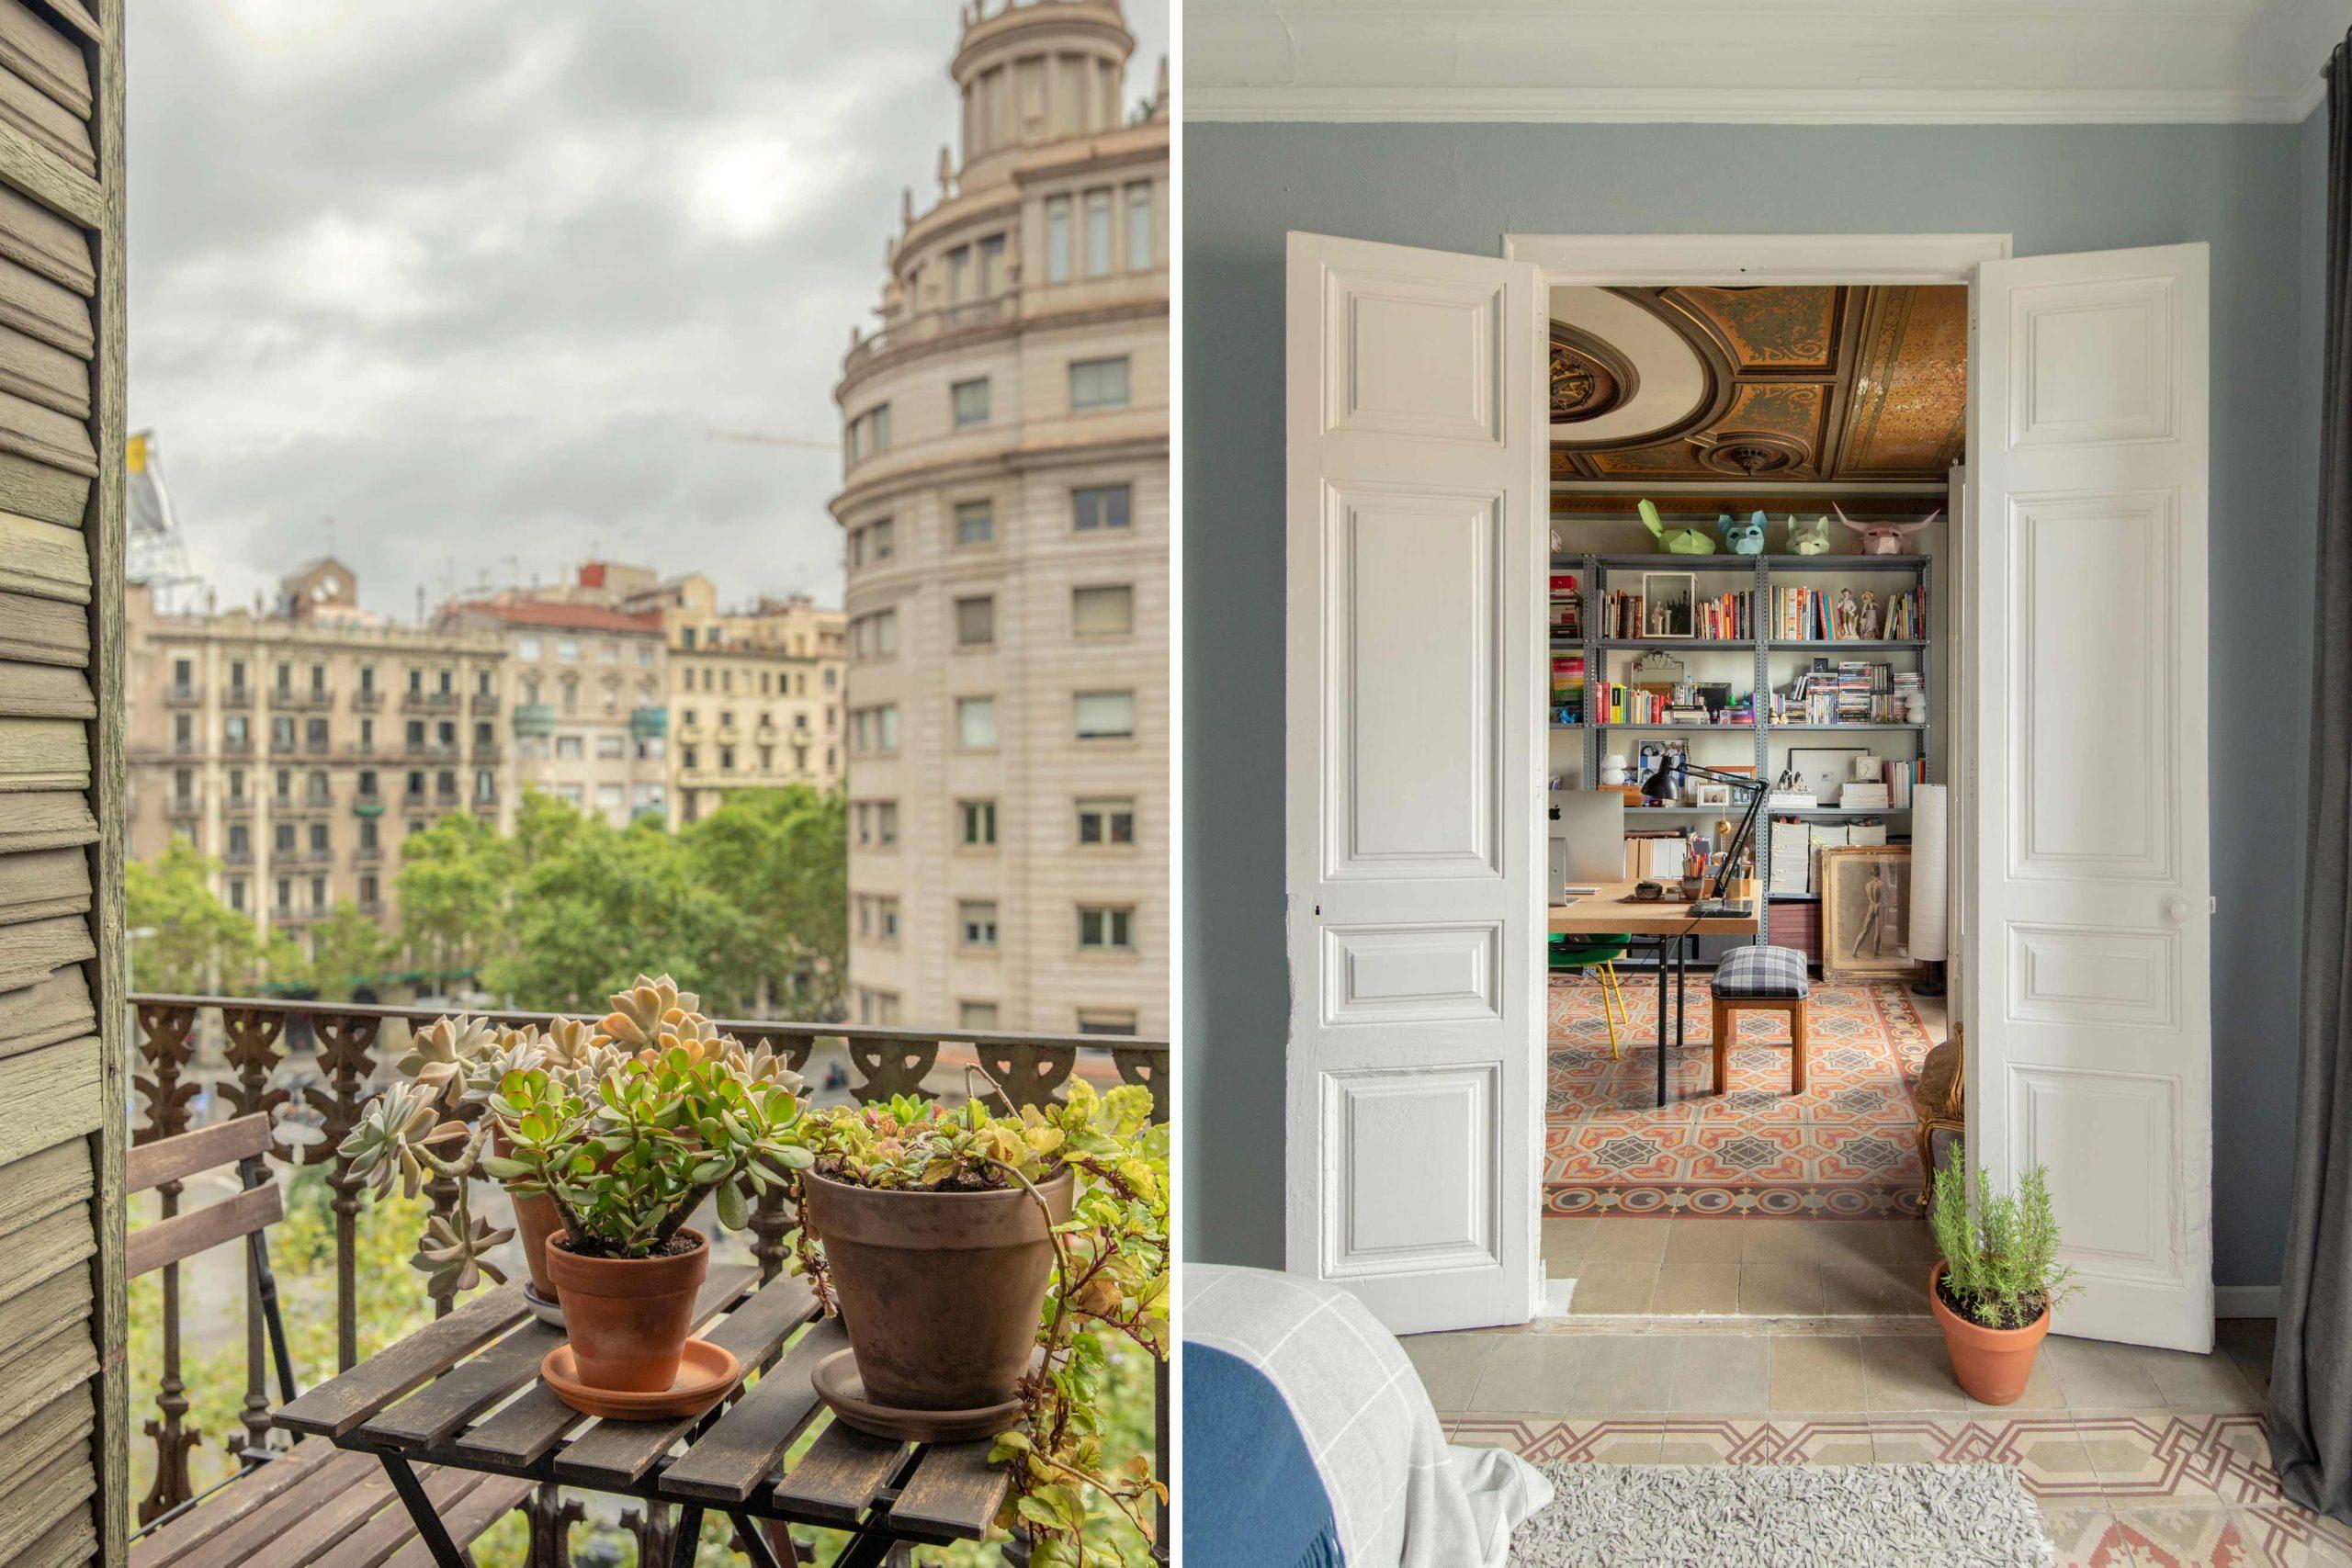 1fotografo-de-interiores-barcelona-lintrepideAD